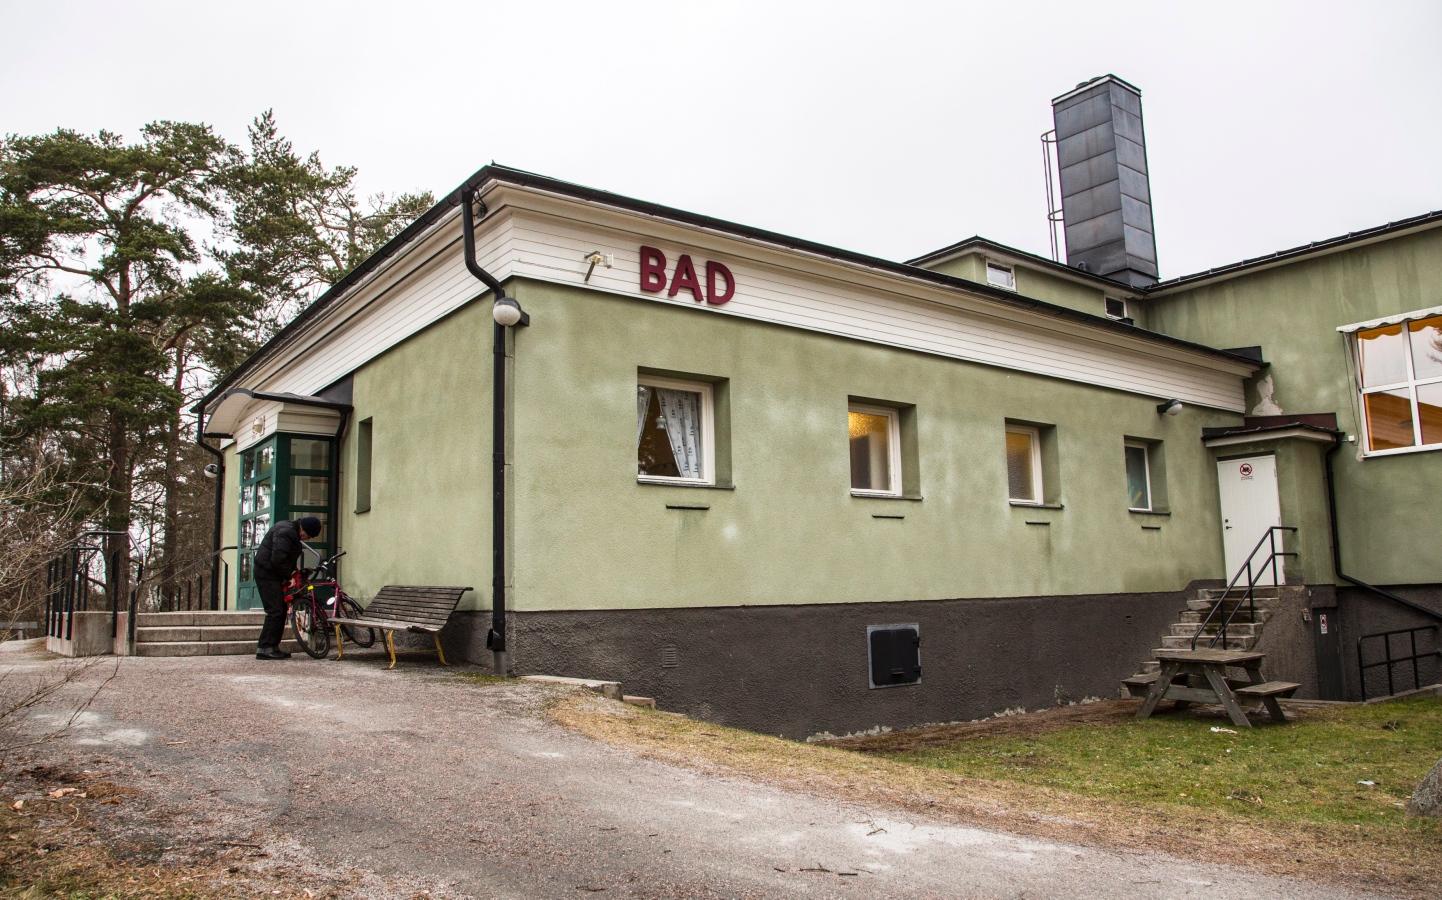 sverige match solarium stockholm city